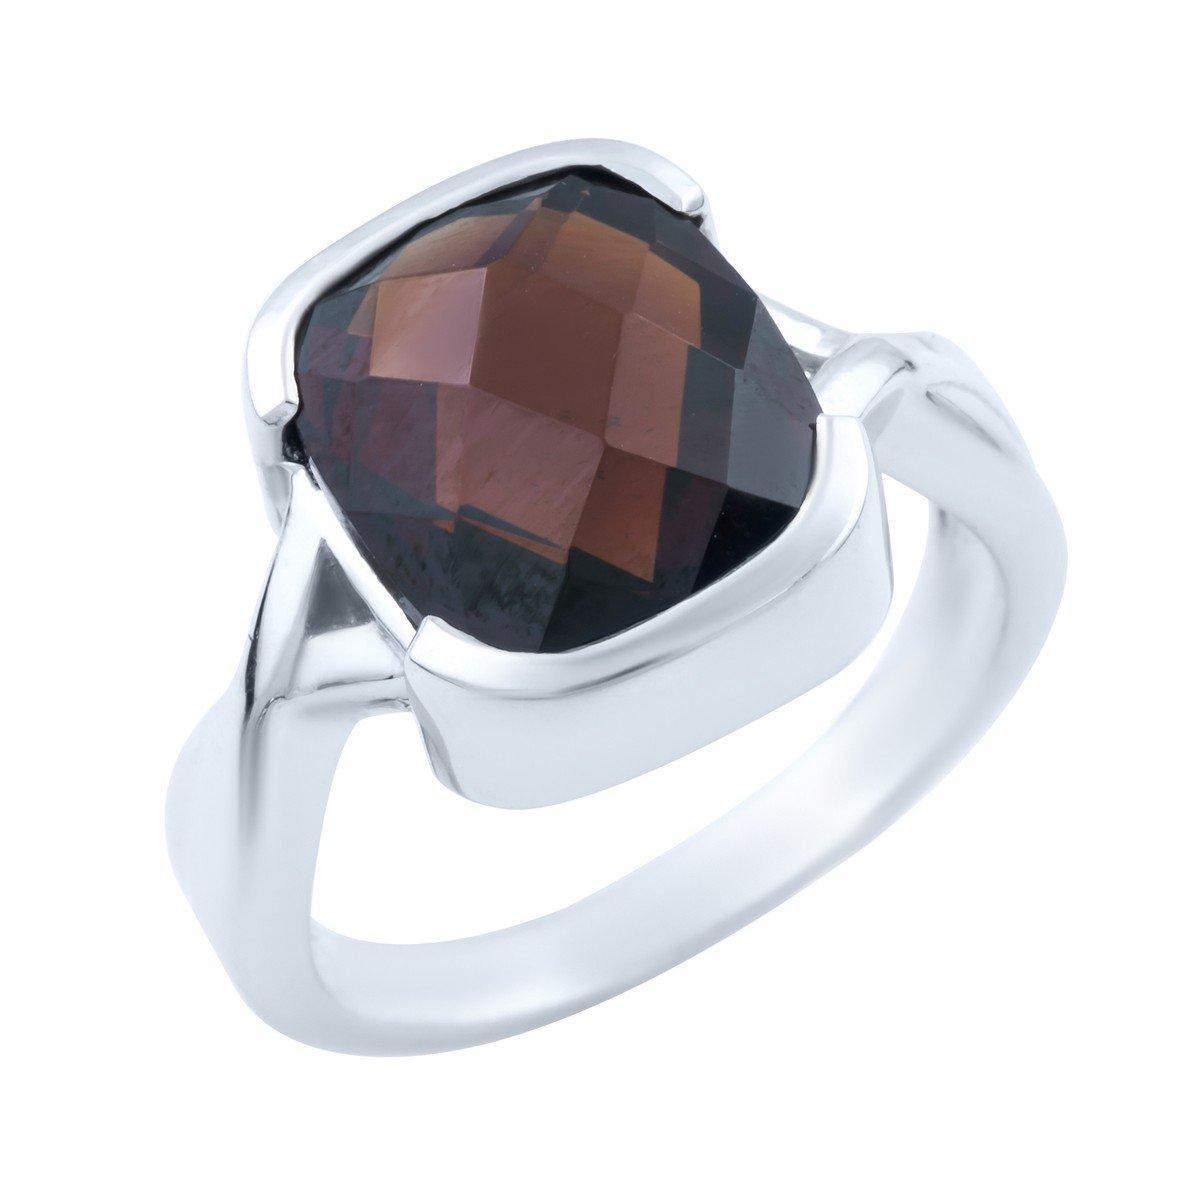 Серебряное кольцо DreamJewelry с натуральным гранатом (1663684) 18.5 размер